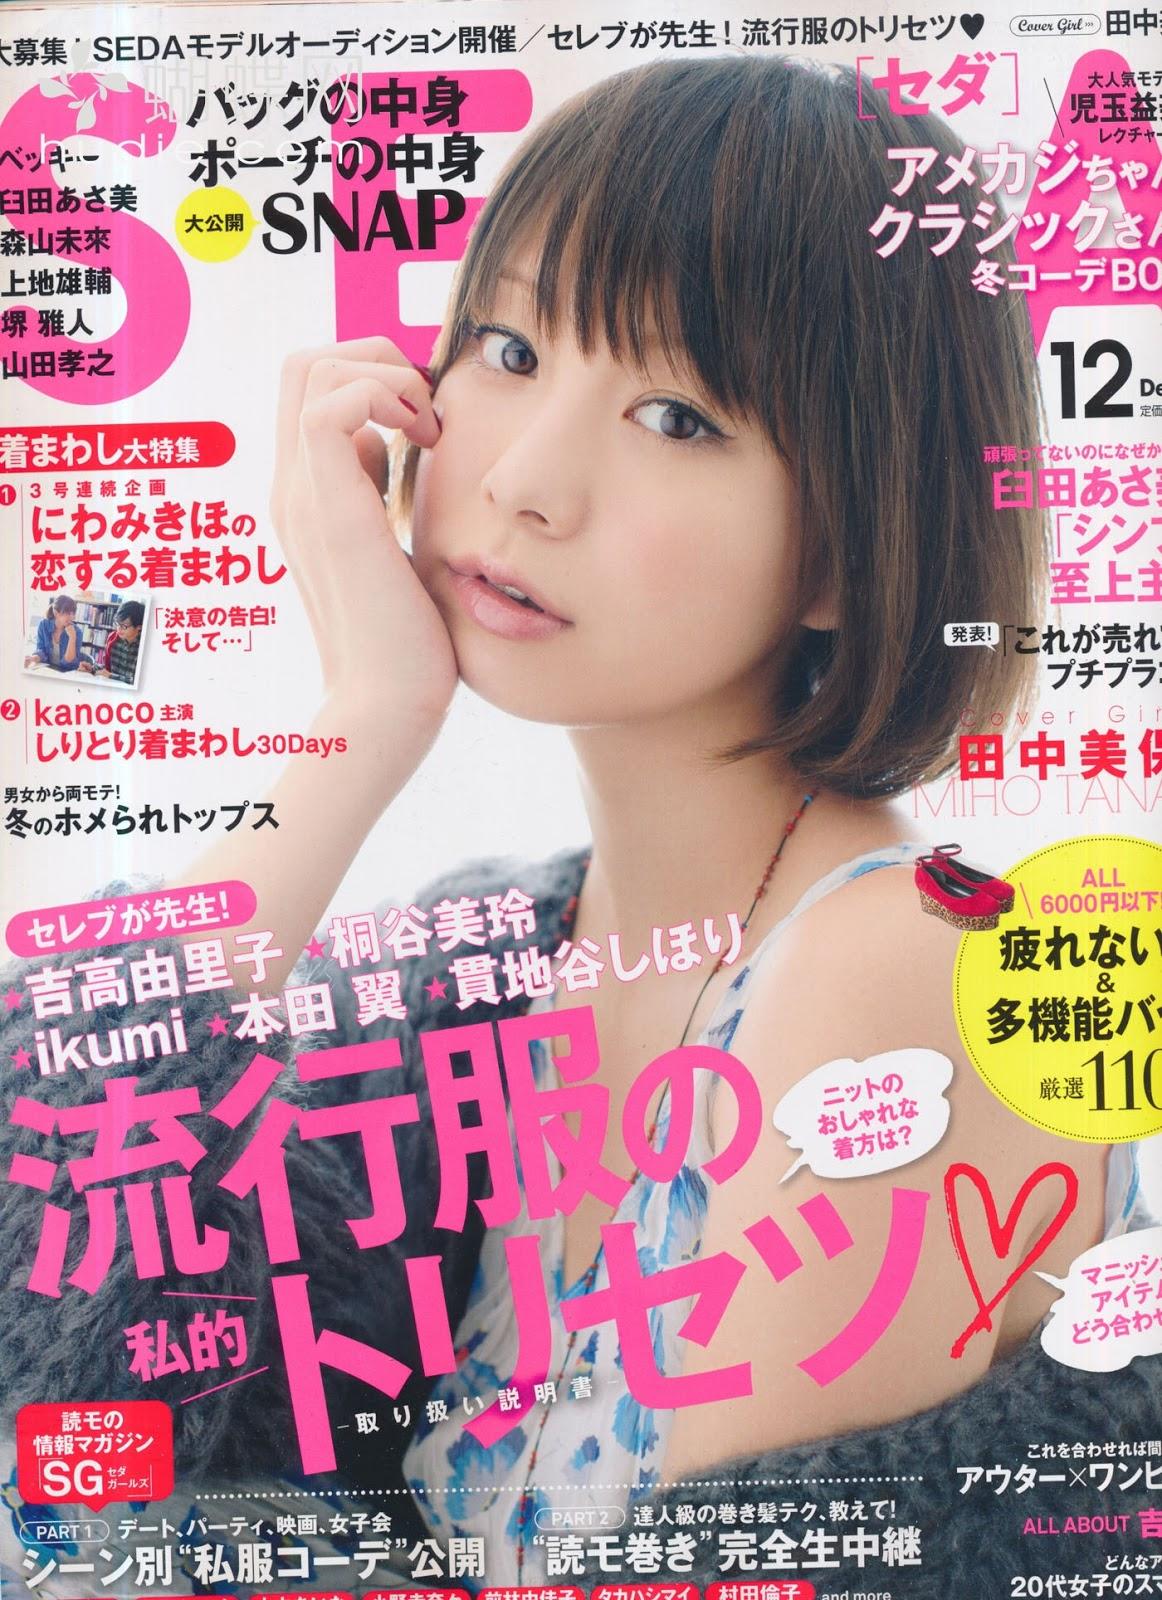 SEDA (セダ) December 2012年12月号 【表紙】 田中美保 Miho Tanaka japanese magazine scans